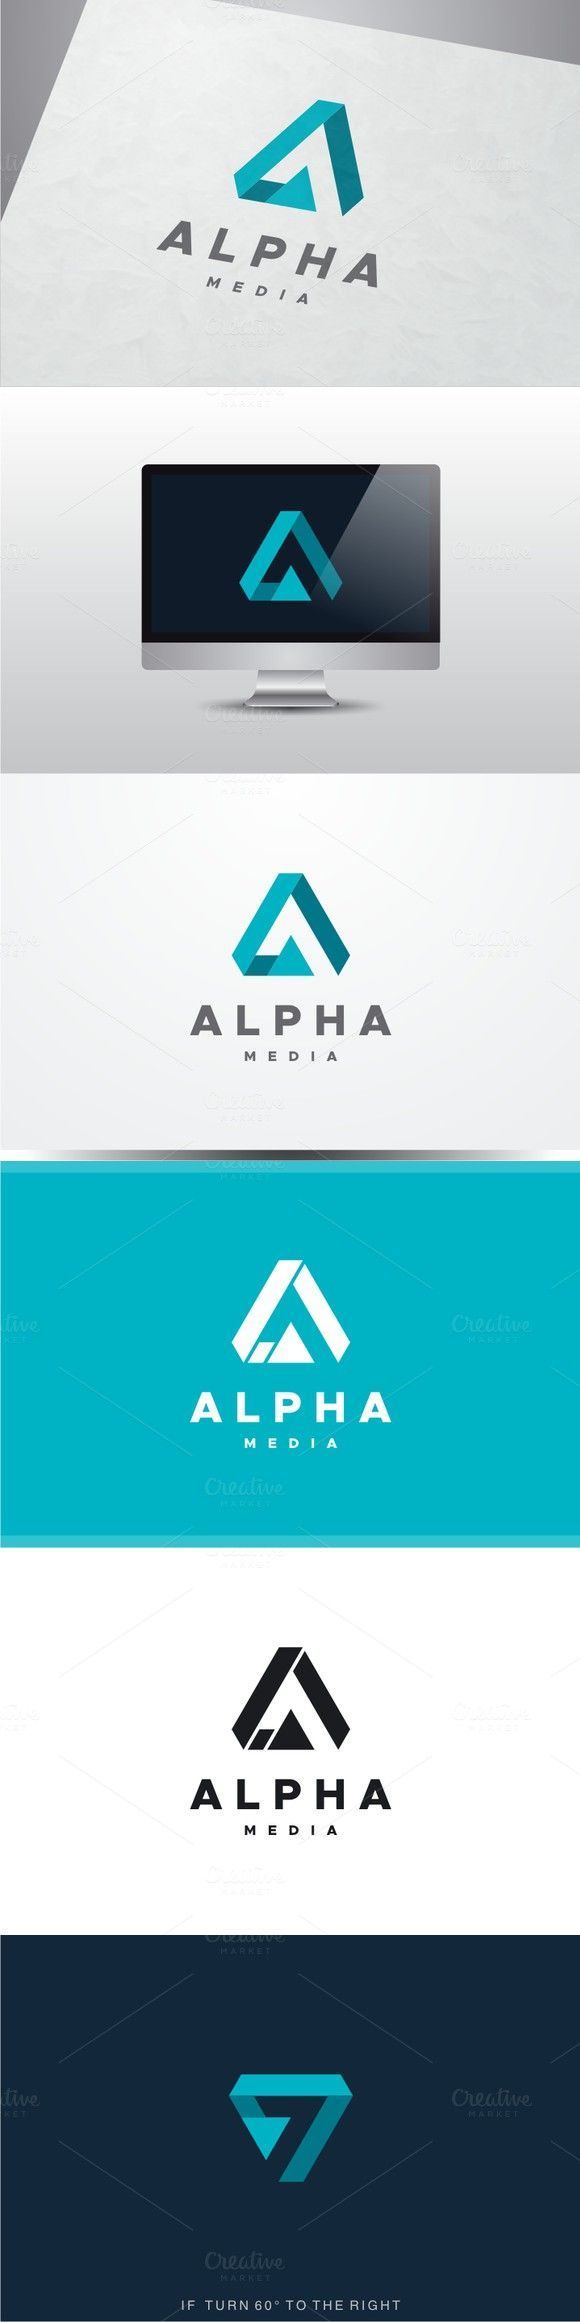 invitation letter for australibusiness visa%0A Alpha Media  Letter A Logo  Technology icons